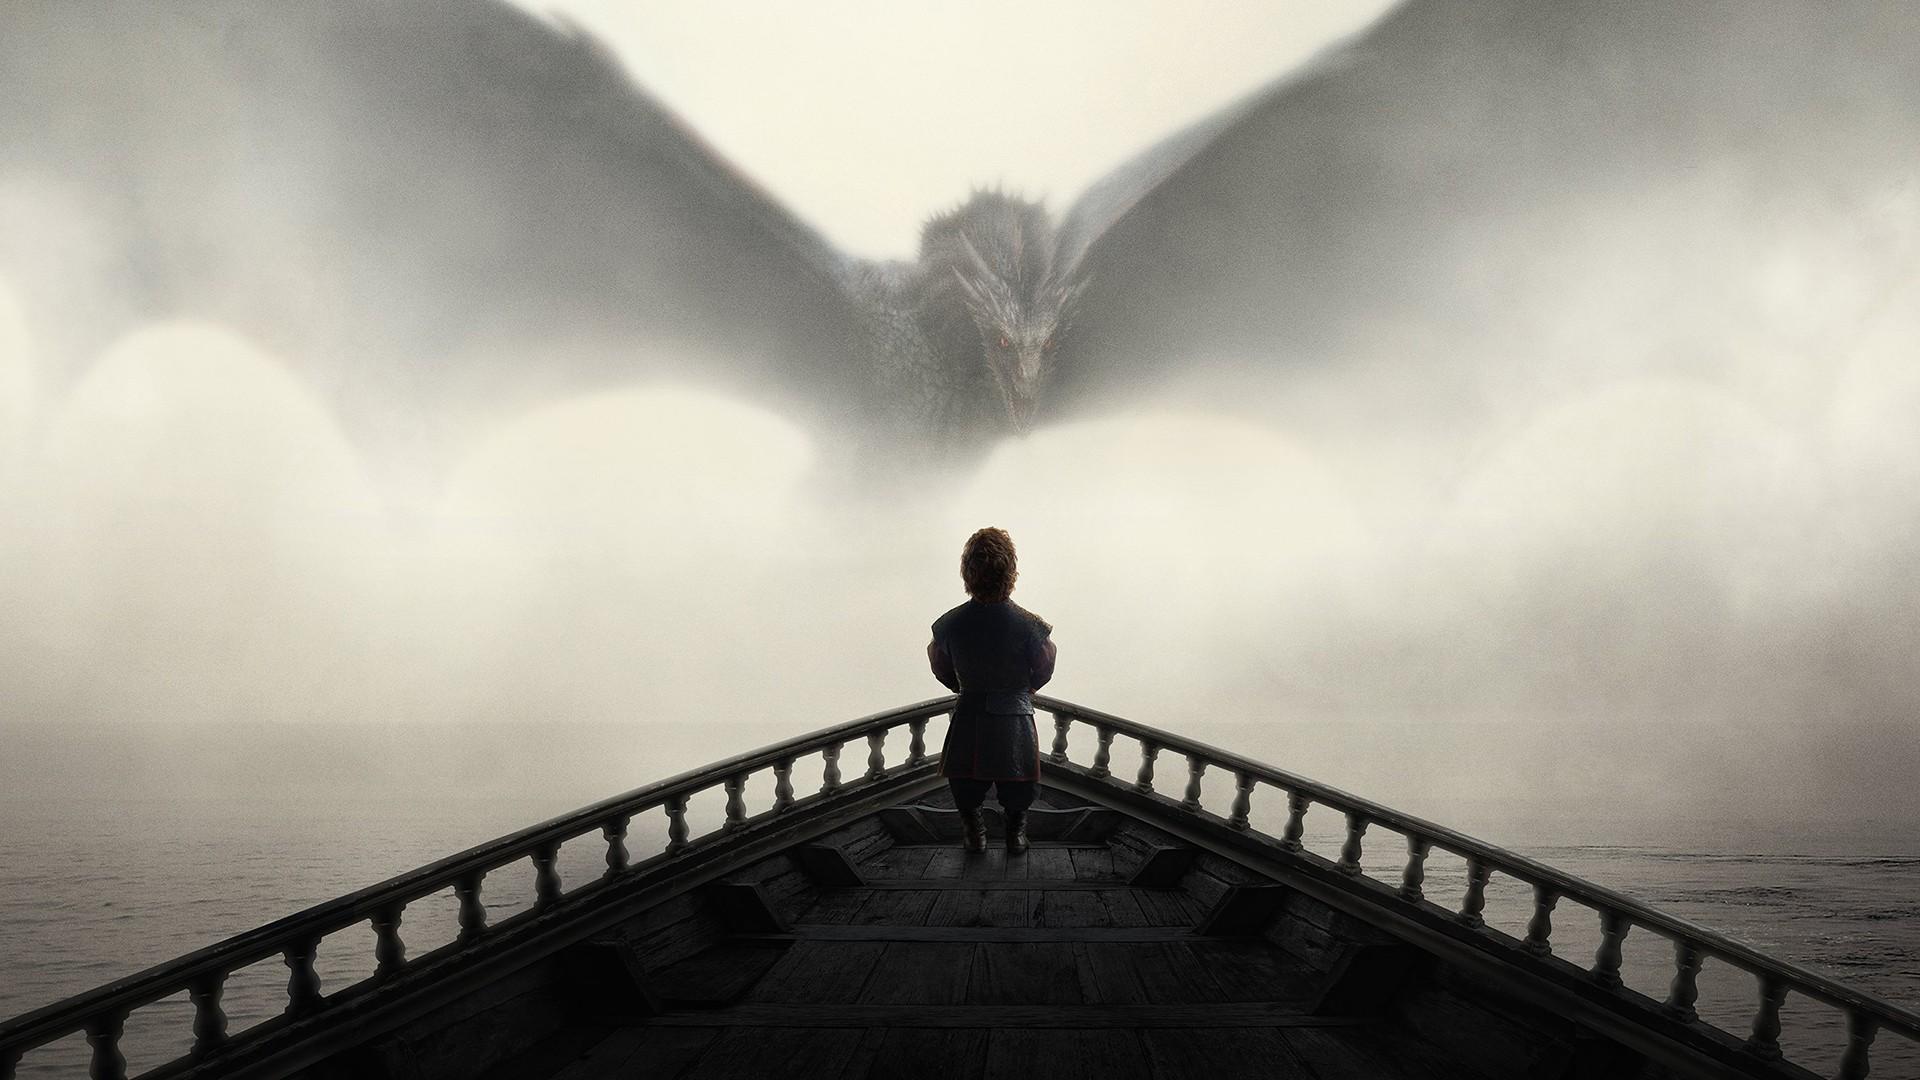 Game Of Thrones Desktop Wallpaper ·① Download Free